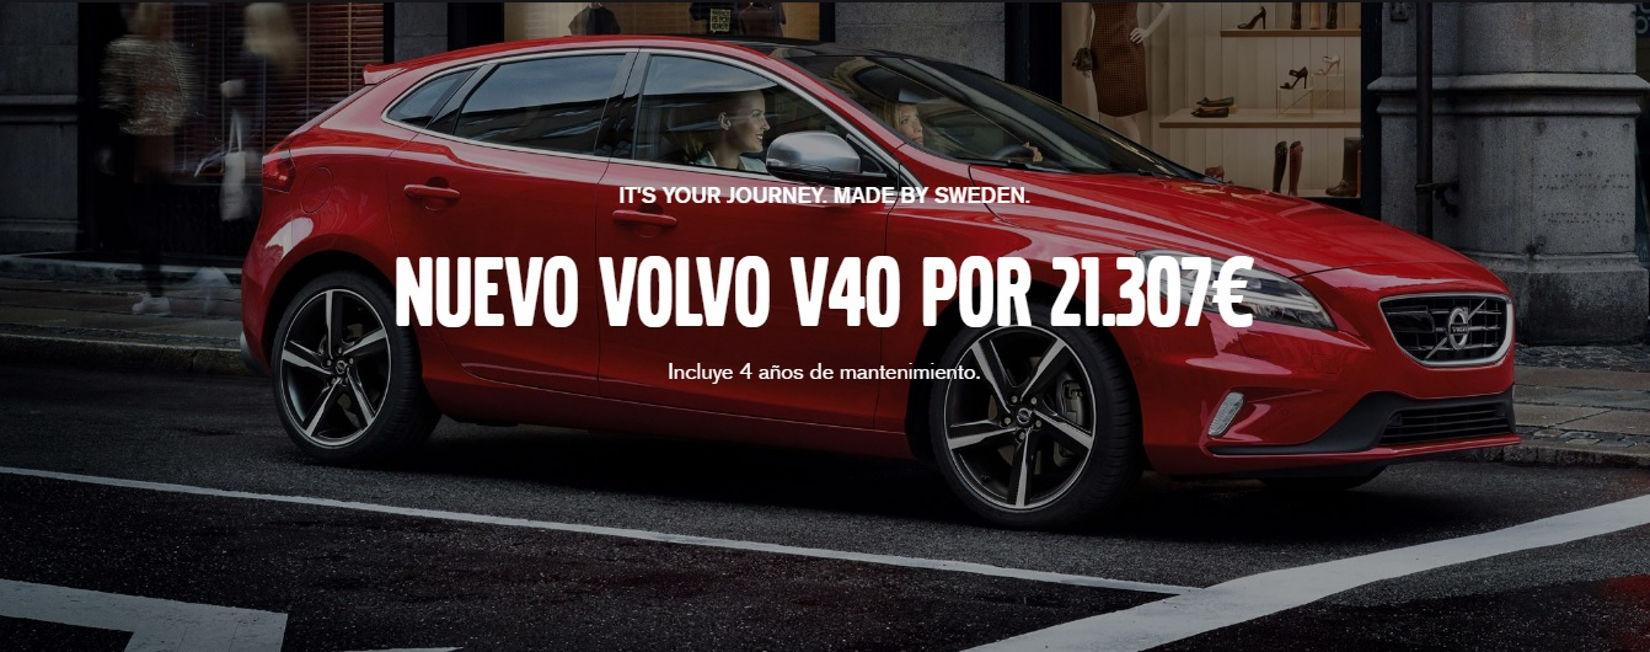 Nuevo Volvo V40 por 21.307€